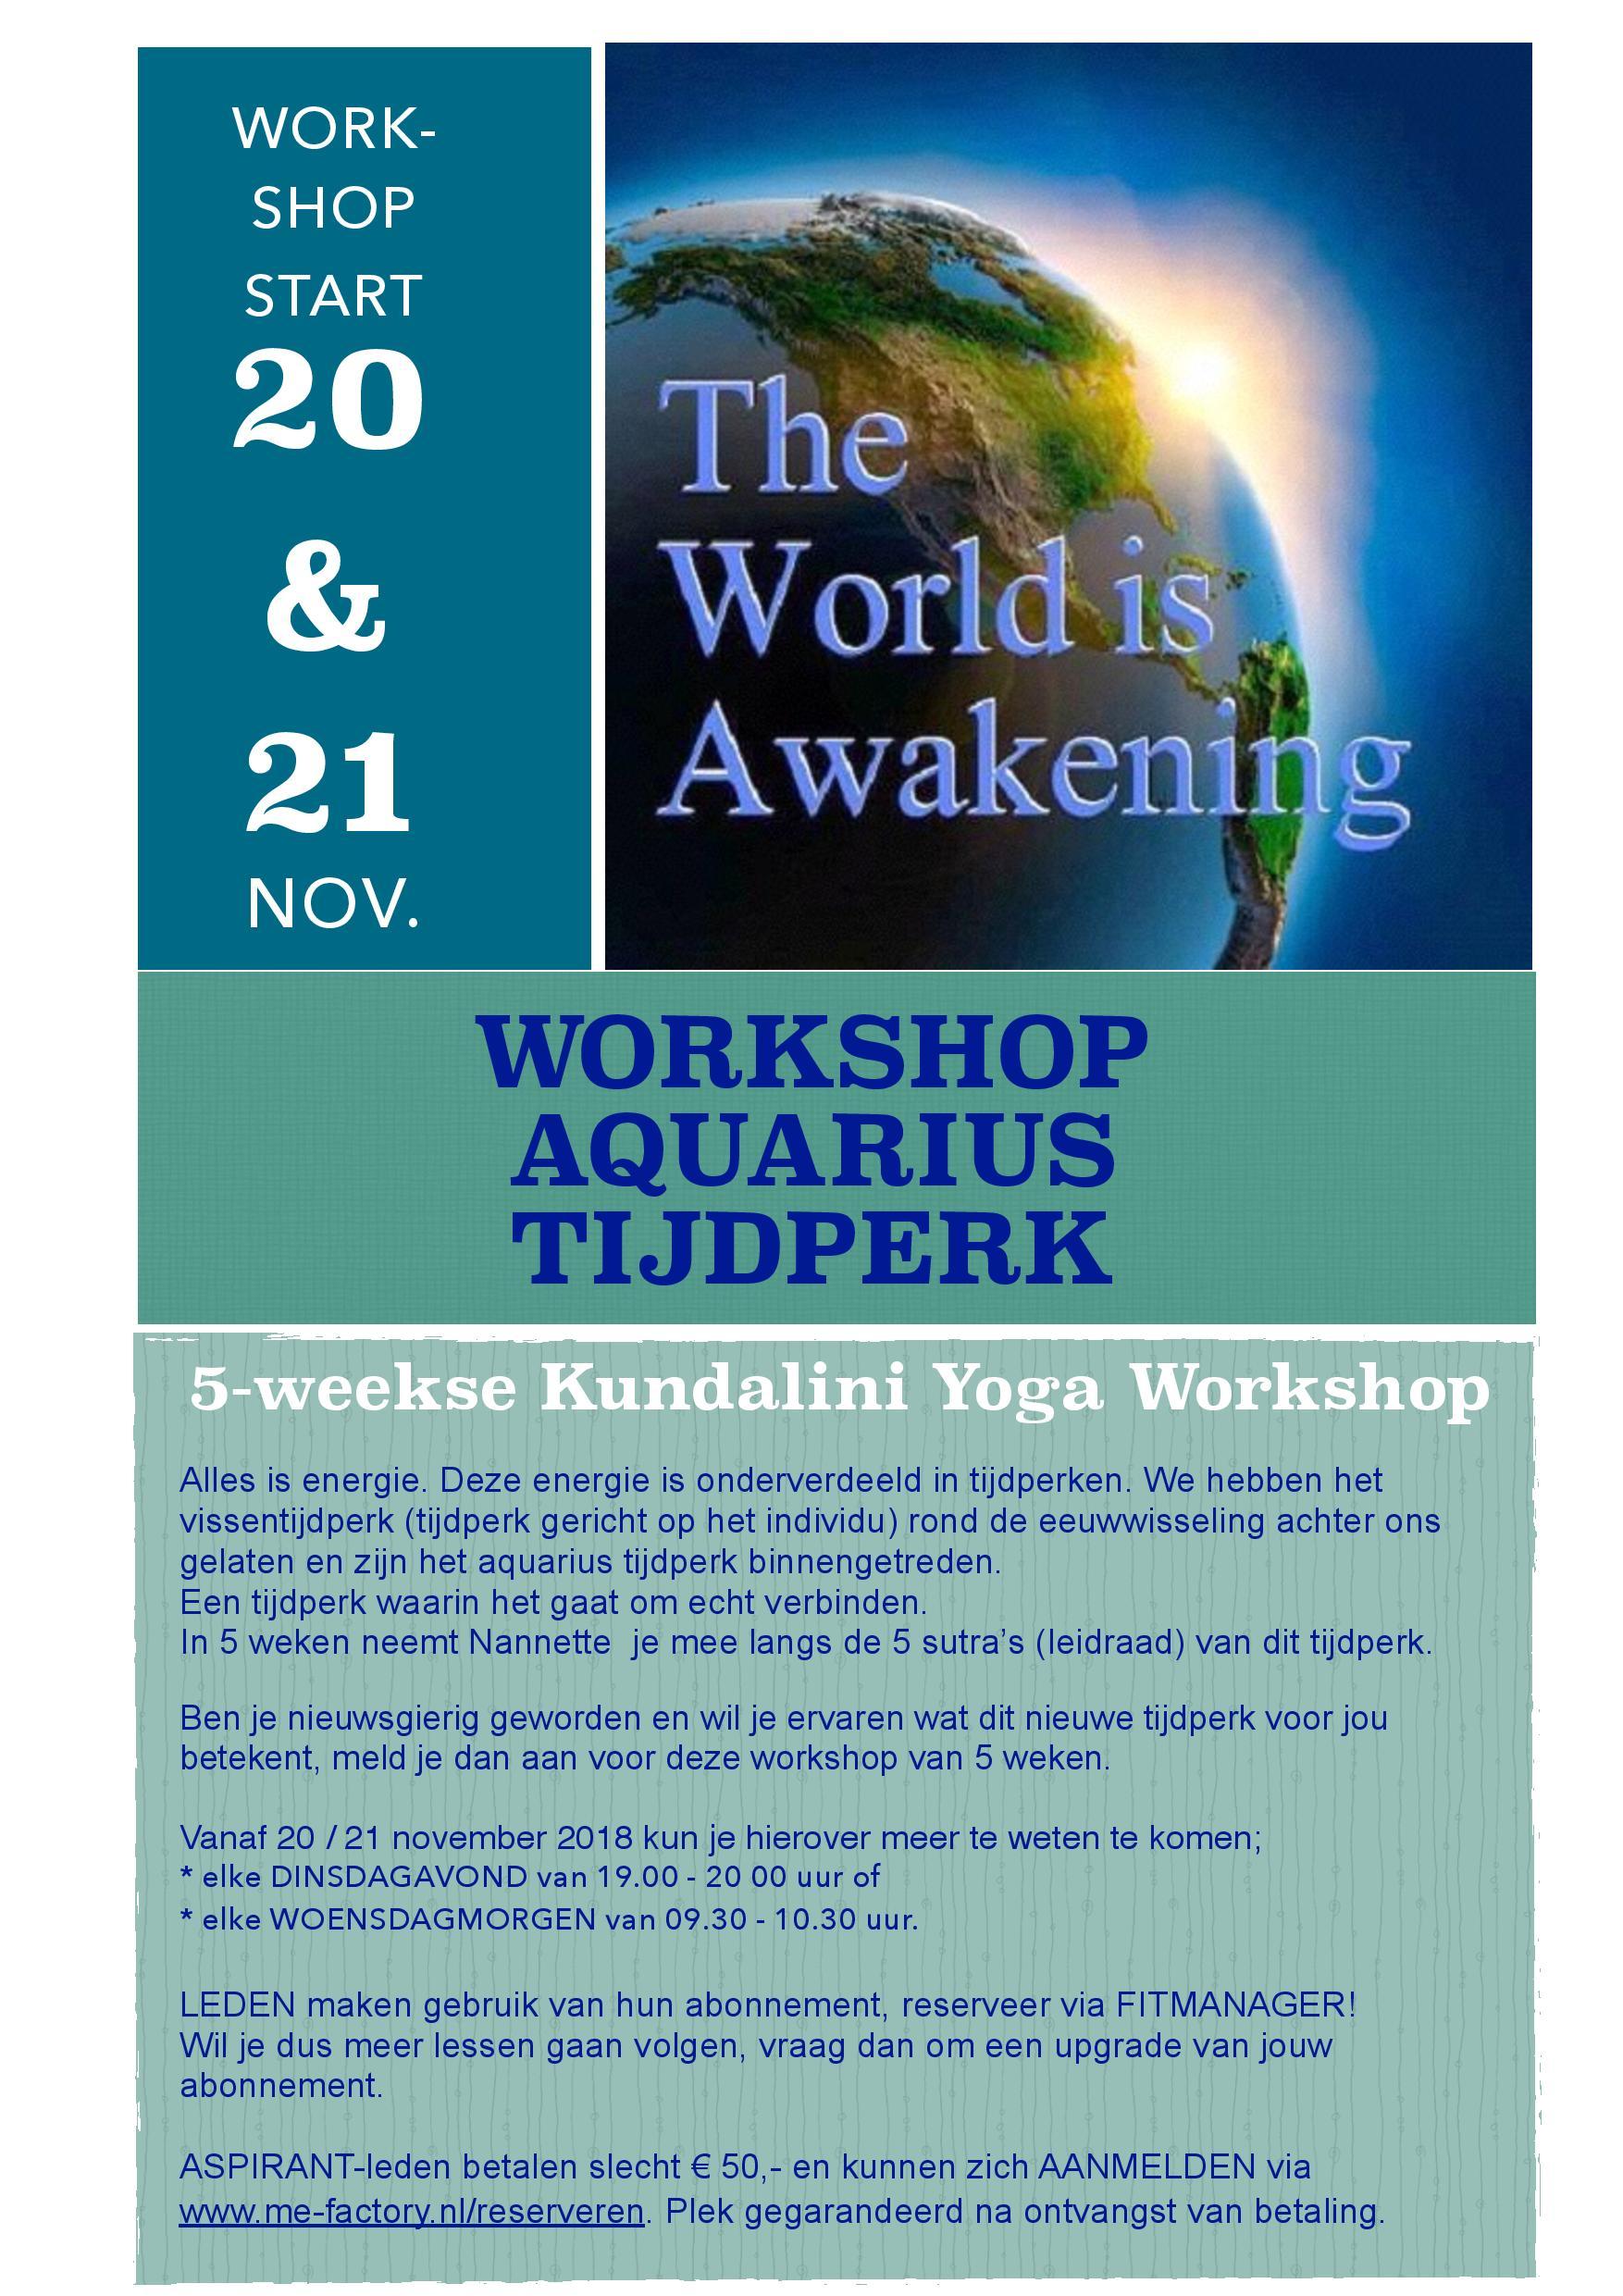 Workshop Aquarius Tijdperk vanaf 20 november